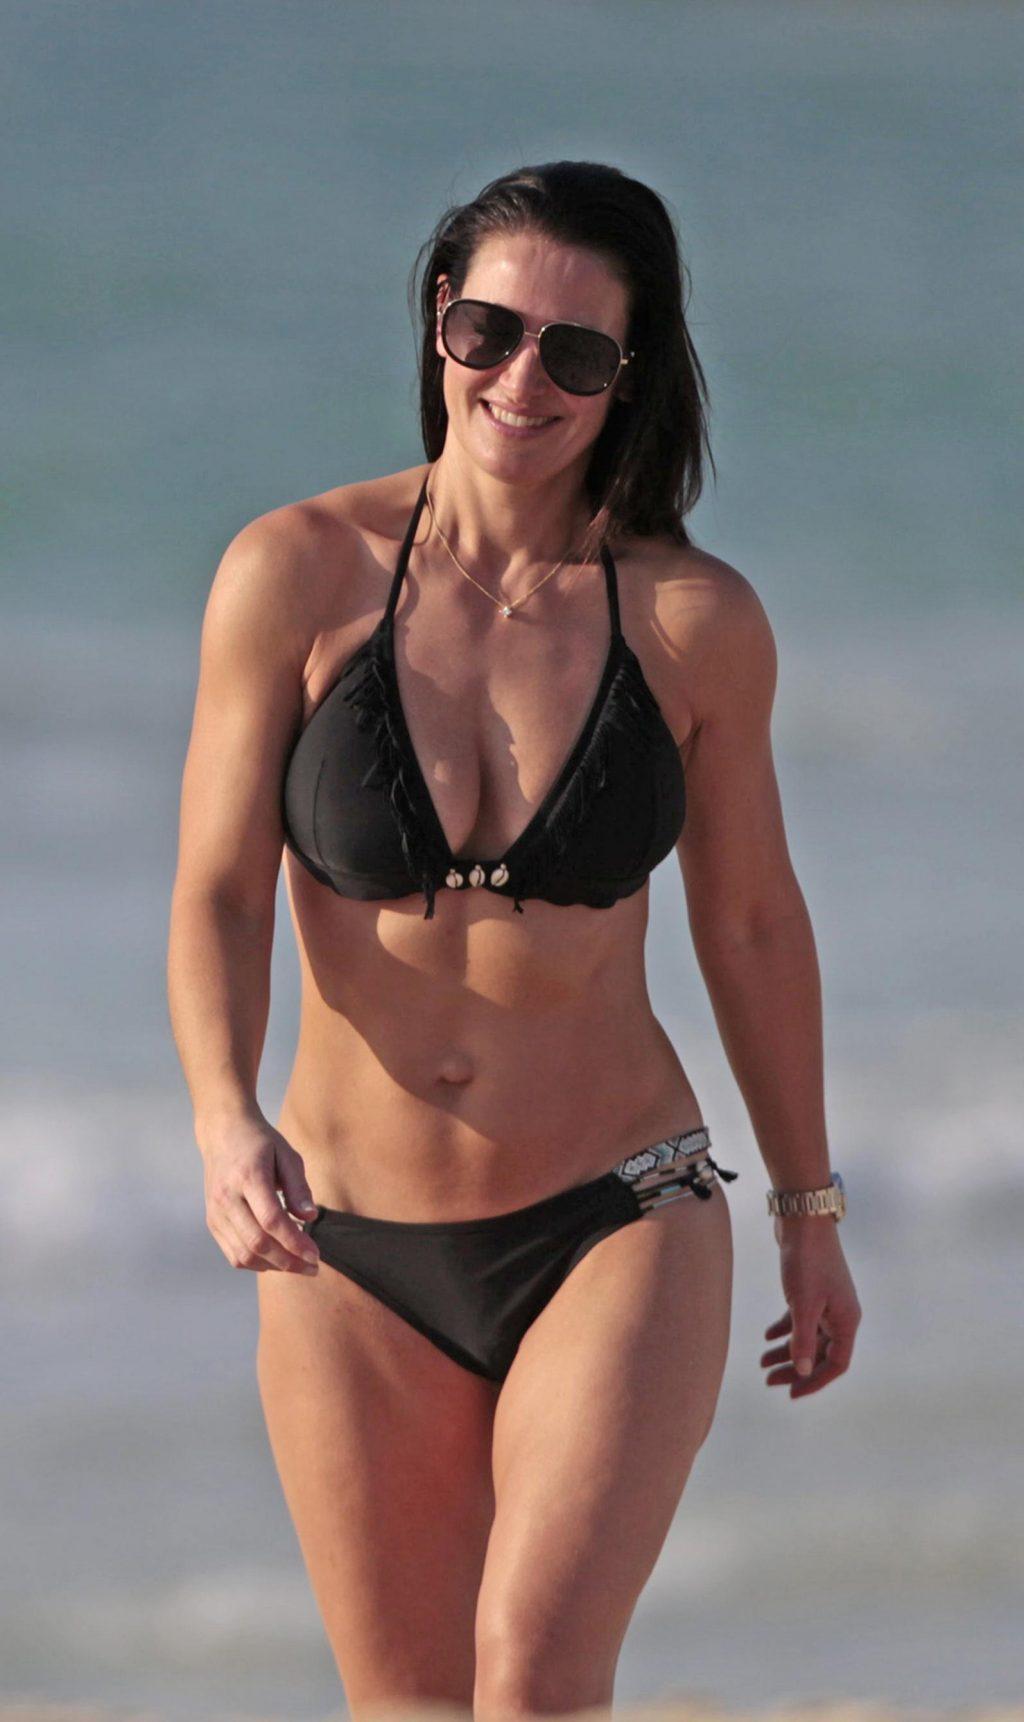 Kirsty Gallacher & Natalie Pinkham Bikini